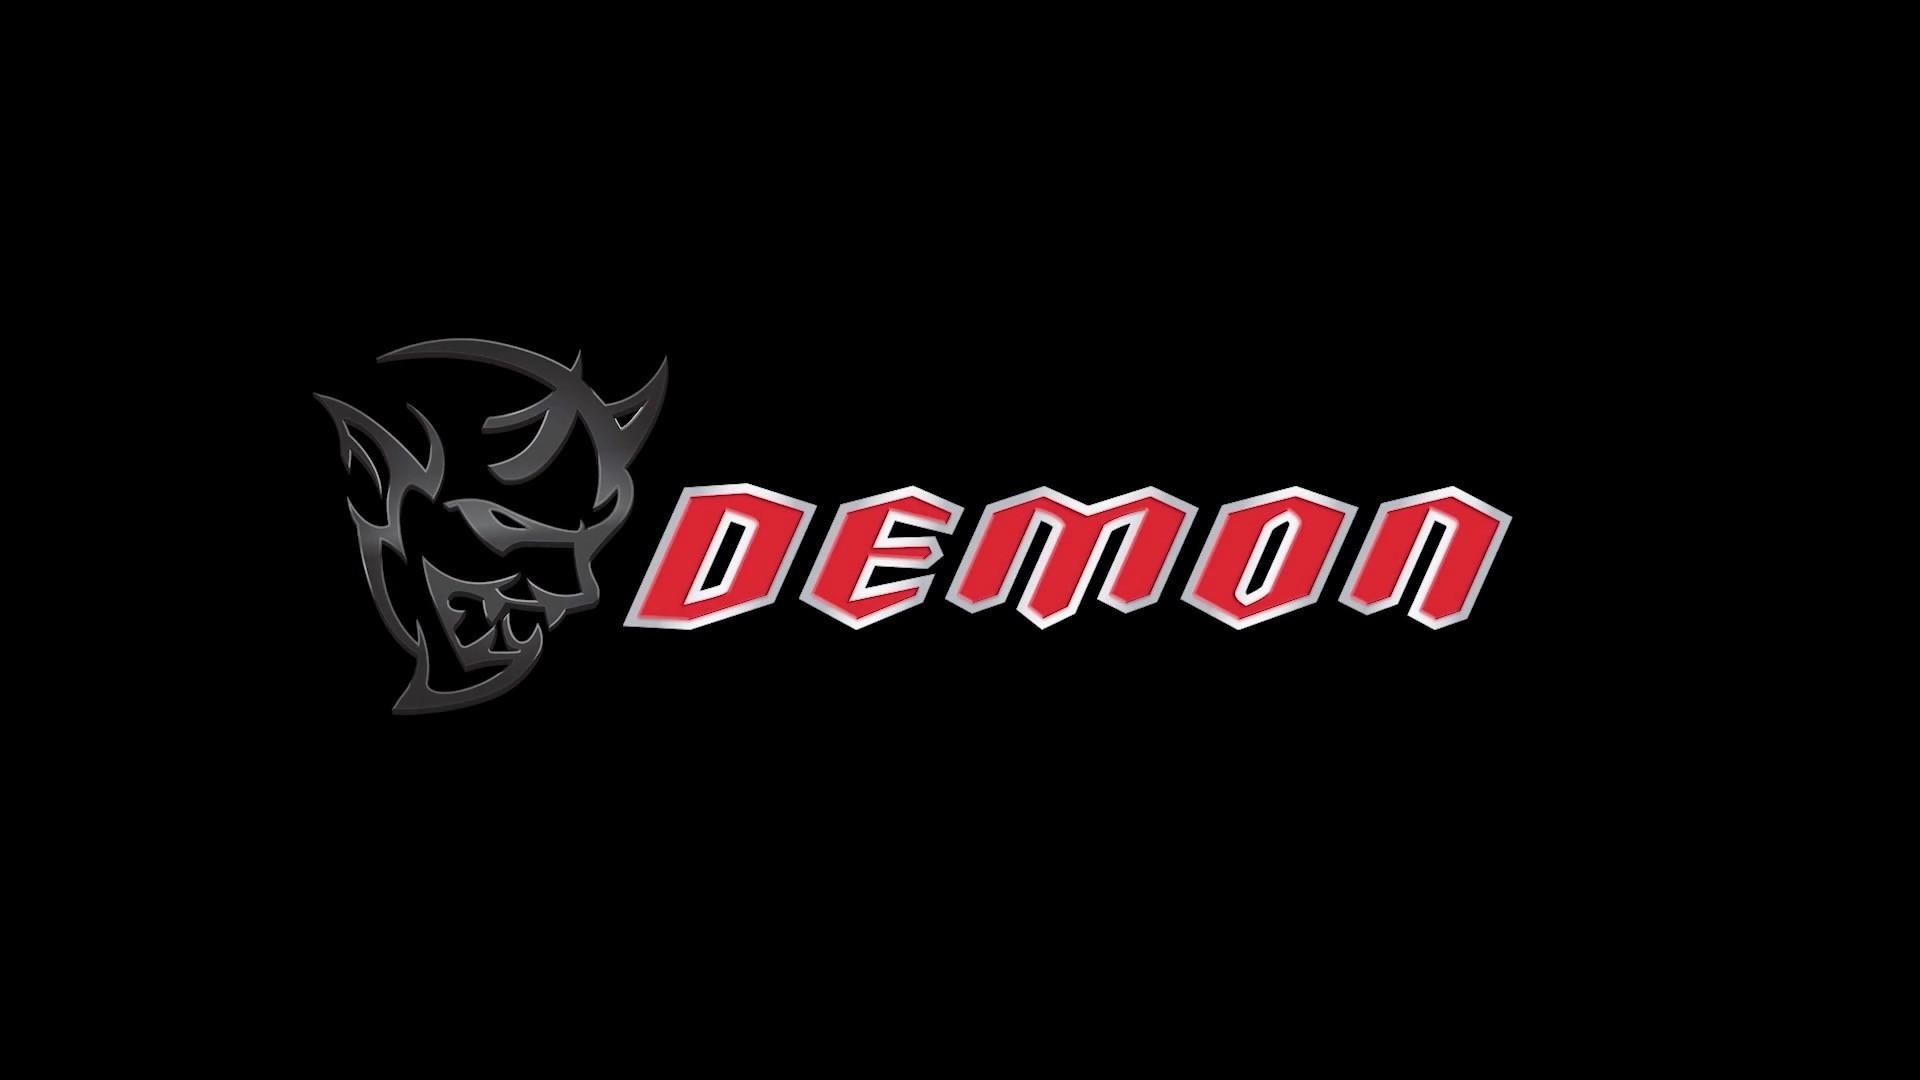 Dodge Demon Logo HD Wallpaper